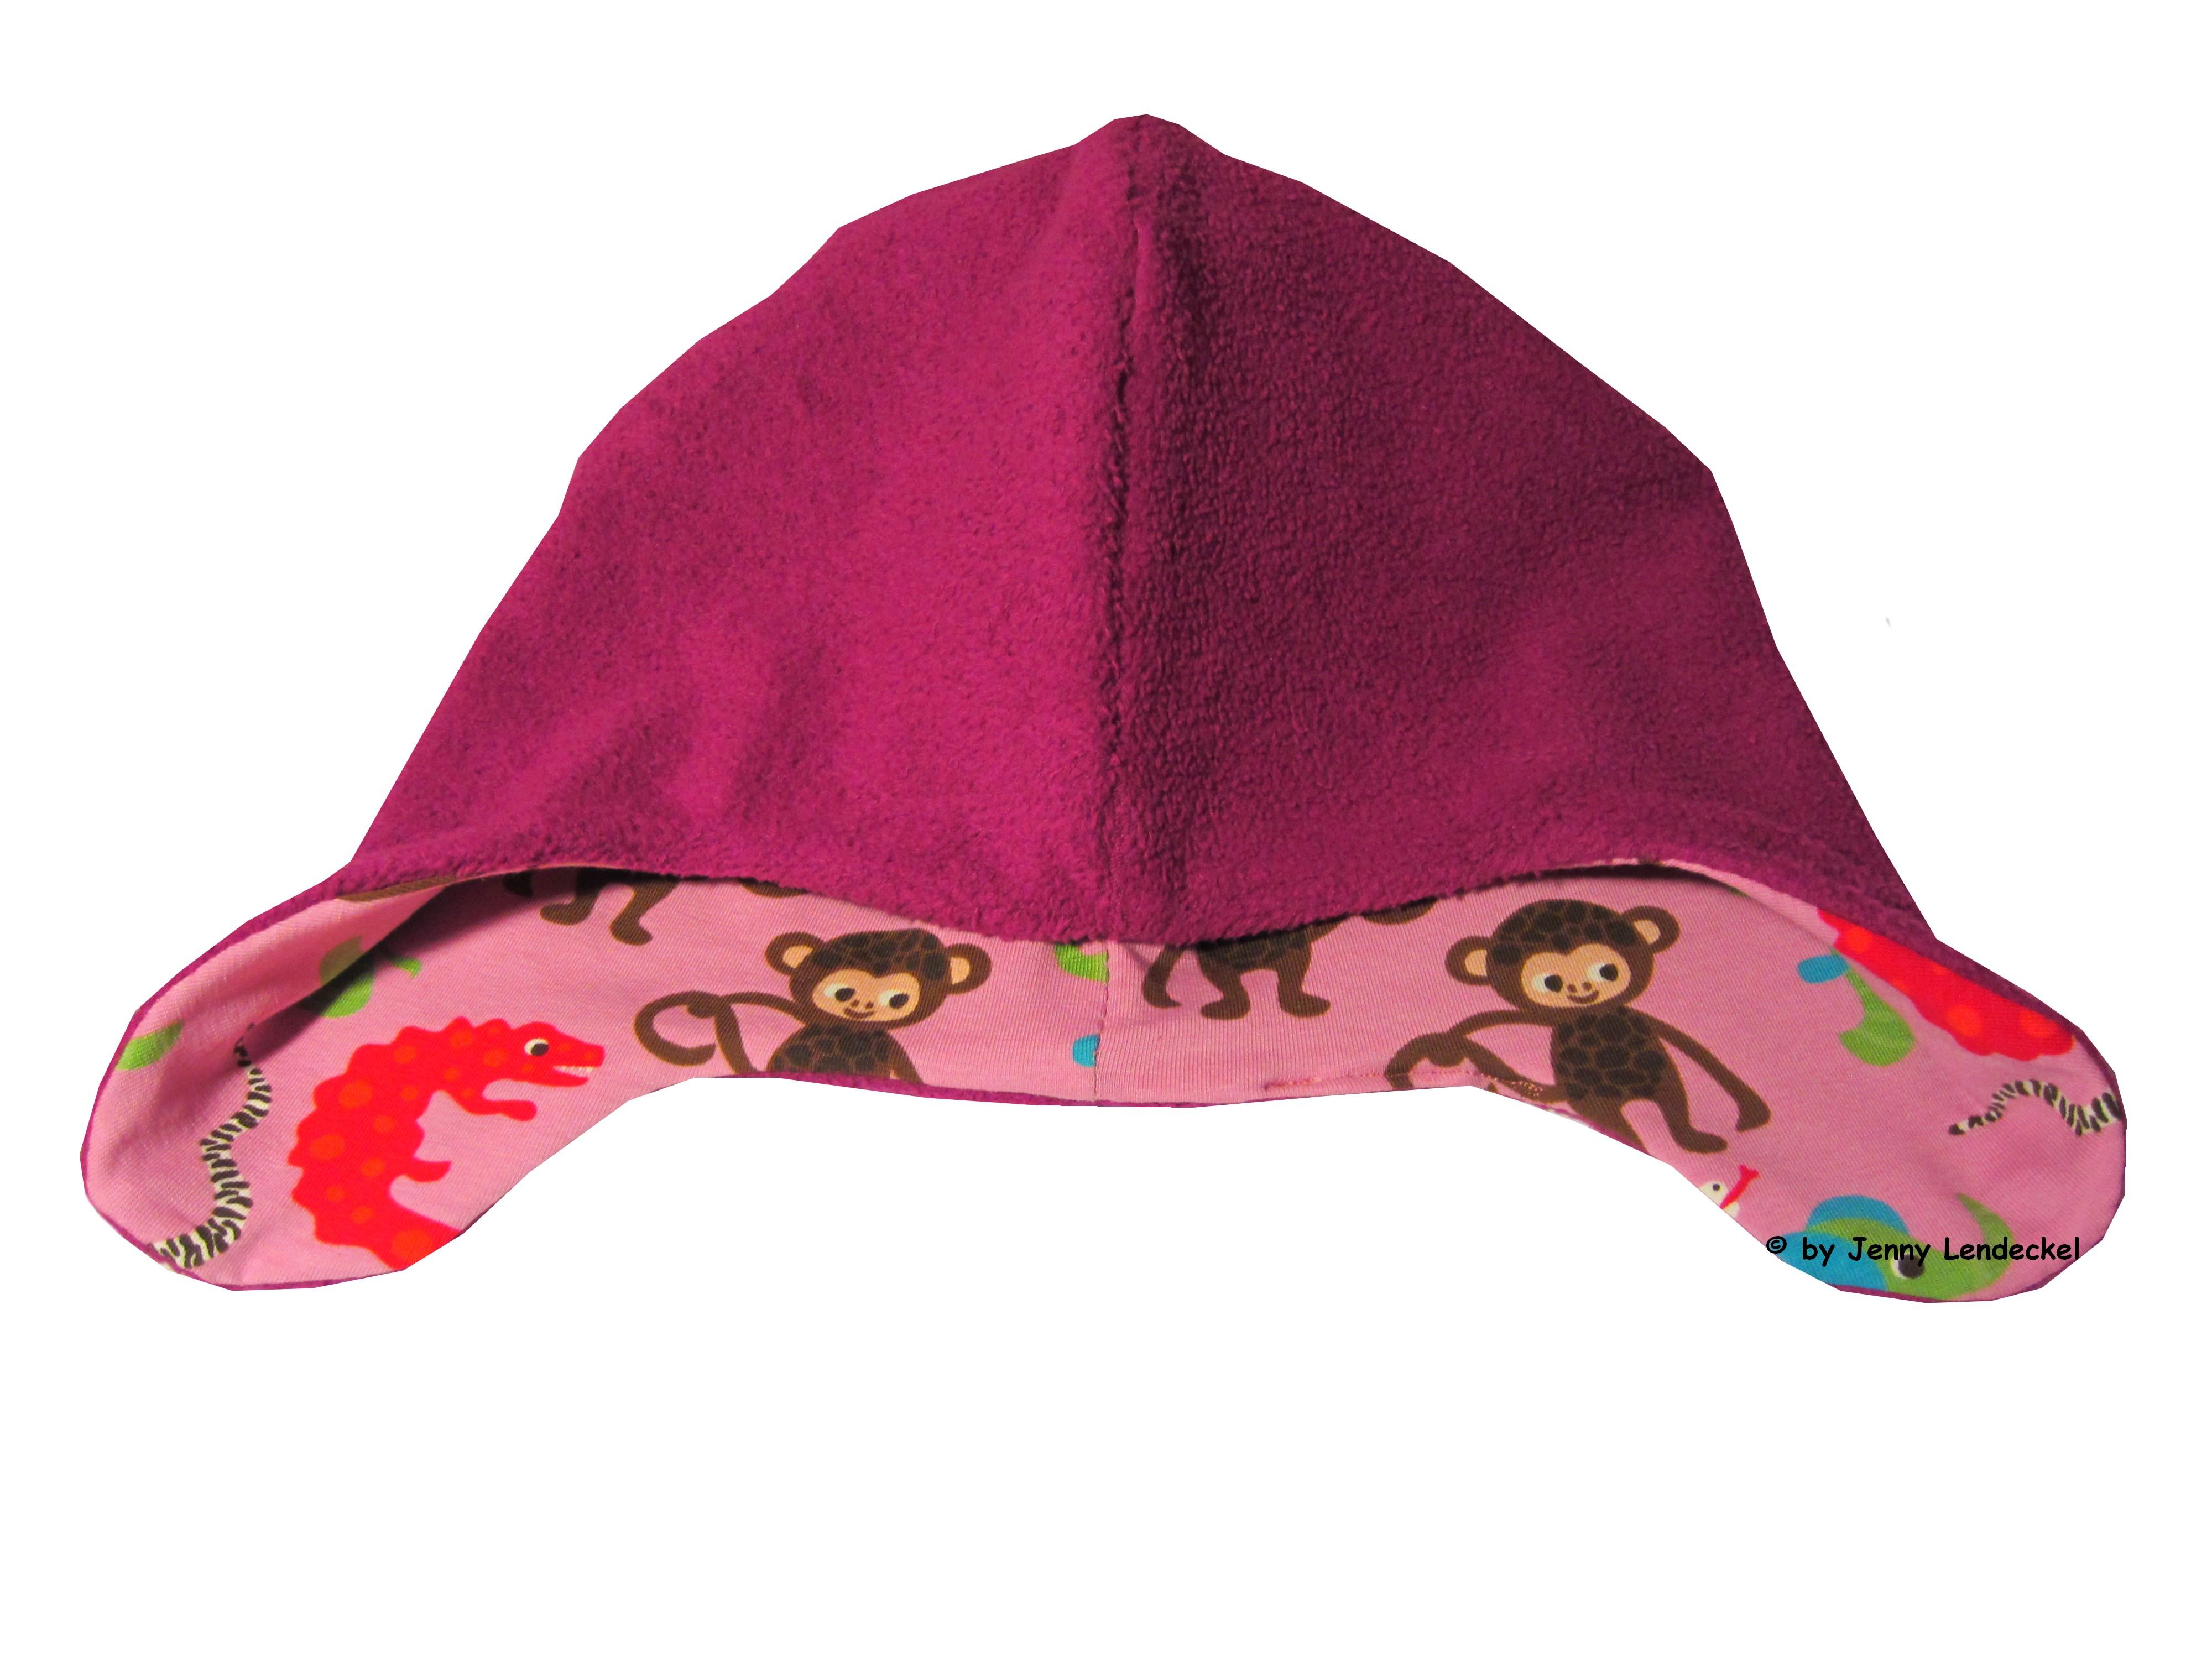 Beste Ein Kostenloses Hut Muster Nähen Galerie - Nähmuster-Ideen ...